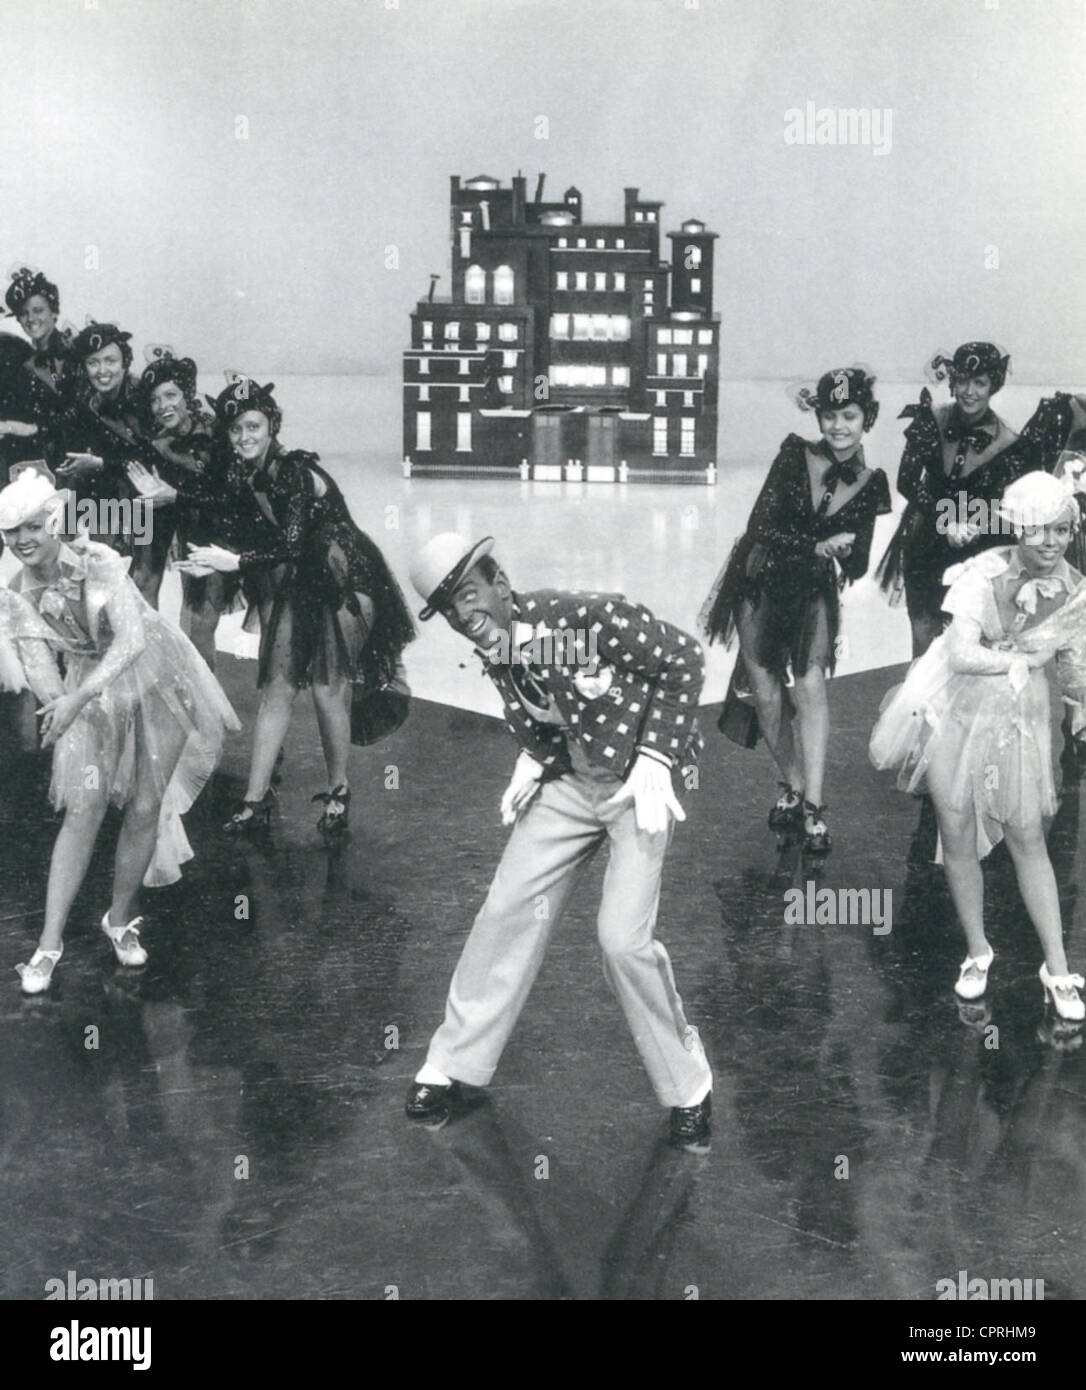 SWING TIME 1936 RKO film avec Fred Astaire dans blackface pour l 'Bojangles of Harlem' nombre Photo Stock